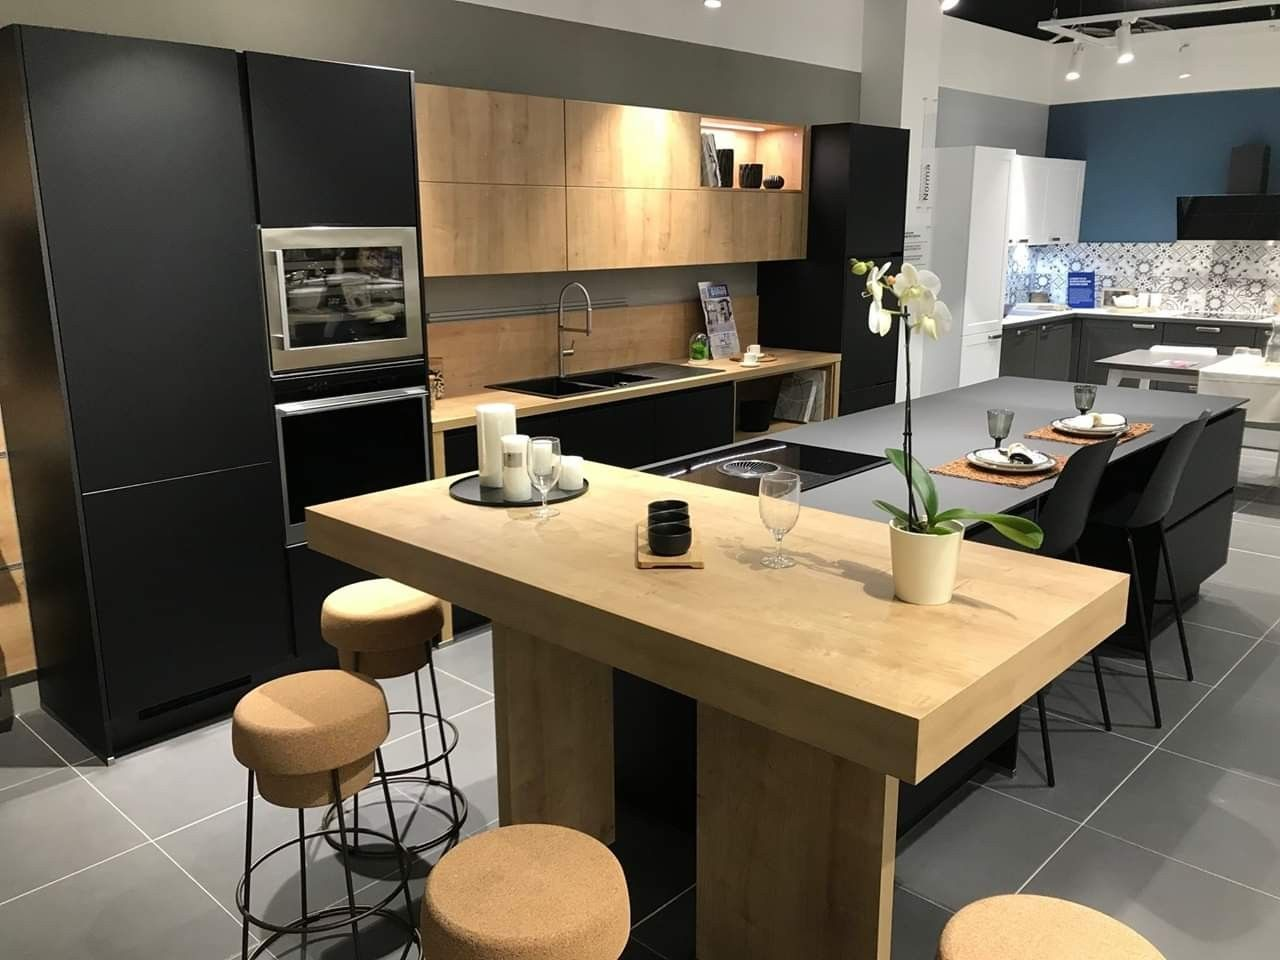 Epingle Par Jessica Munoz Sur Cuisine Deco Cuisine Appartement Cuisine Contemporaine Cuisine Moderne